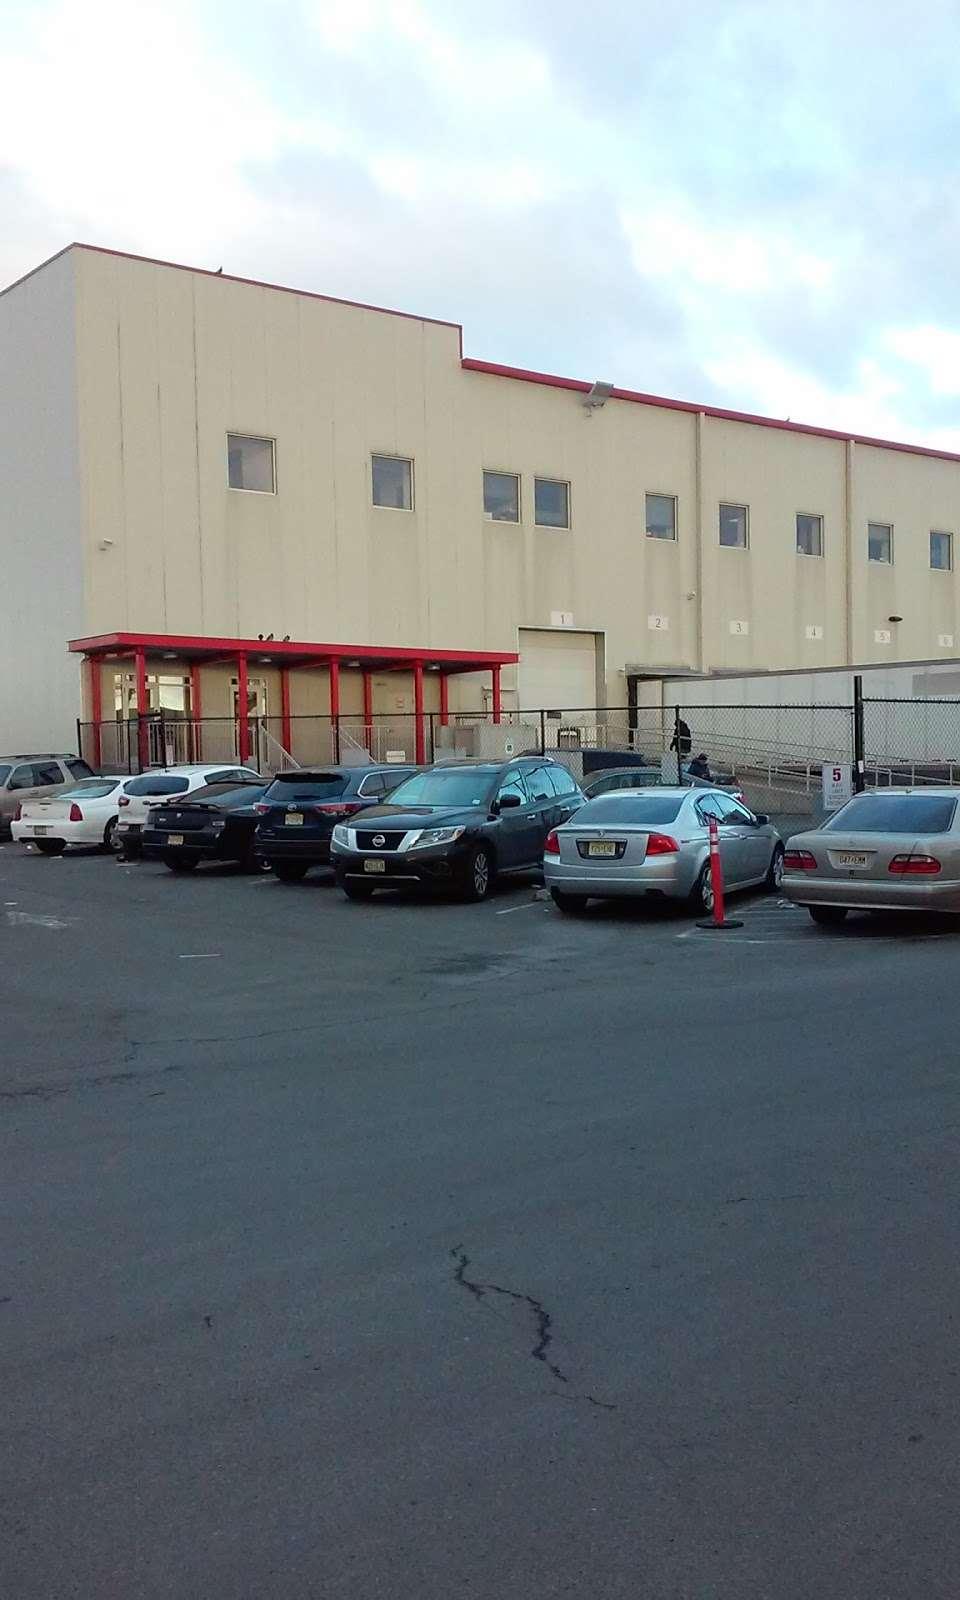 Wakefern Food Corporation - store    Photo 5 of 10   Address: 51 Euclid Ave, Newark, NJ 07105, USA   Phone: (973) 589-3960